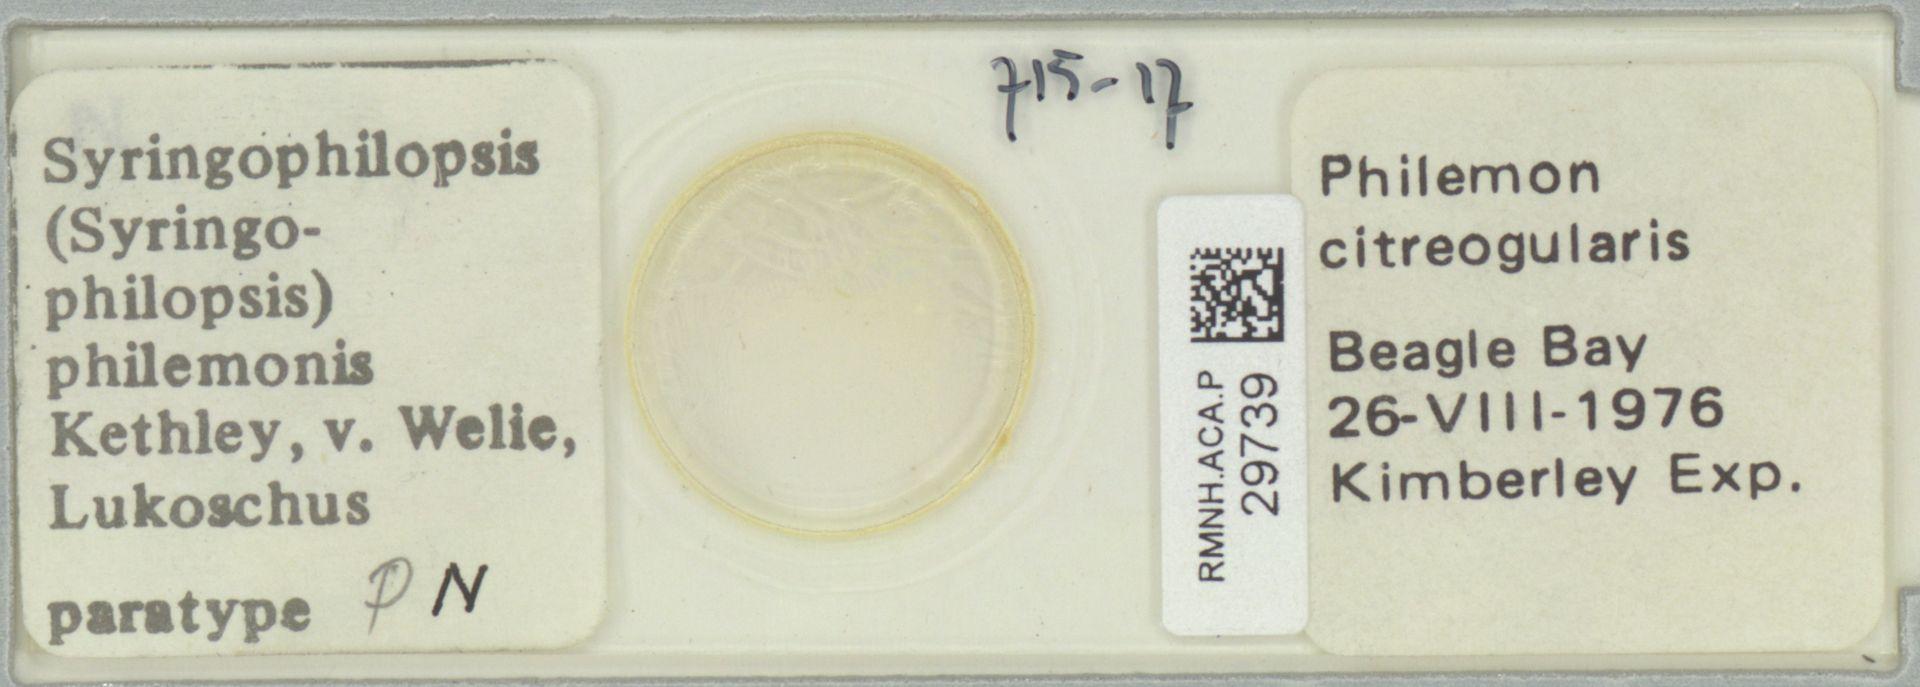 RMNH.ACA.P.29739   Syringophilopsis (Syringophilopsis) philemonis Kethley, v. Welie, Lukoschus